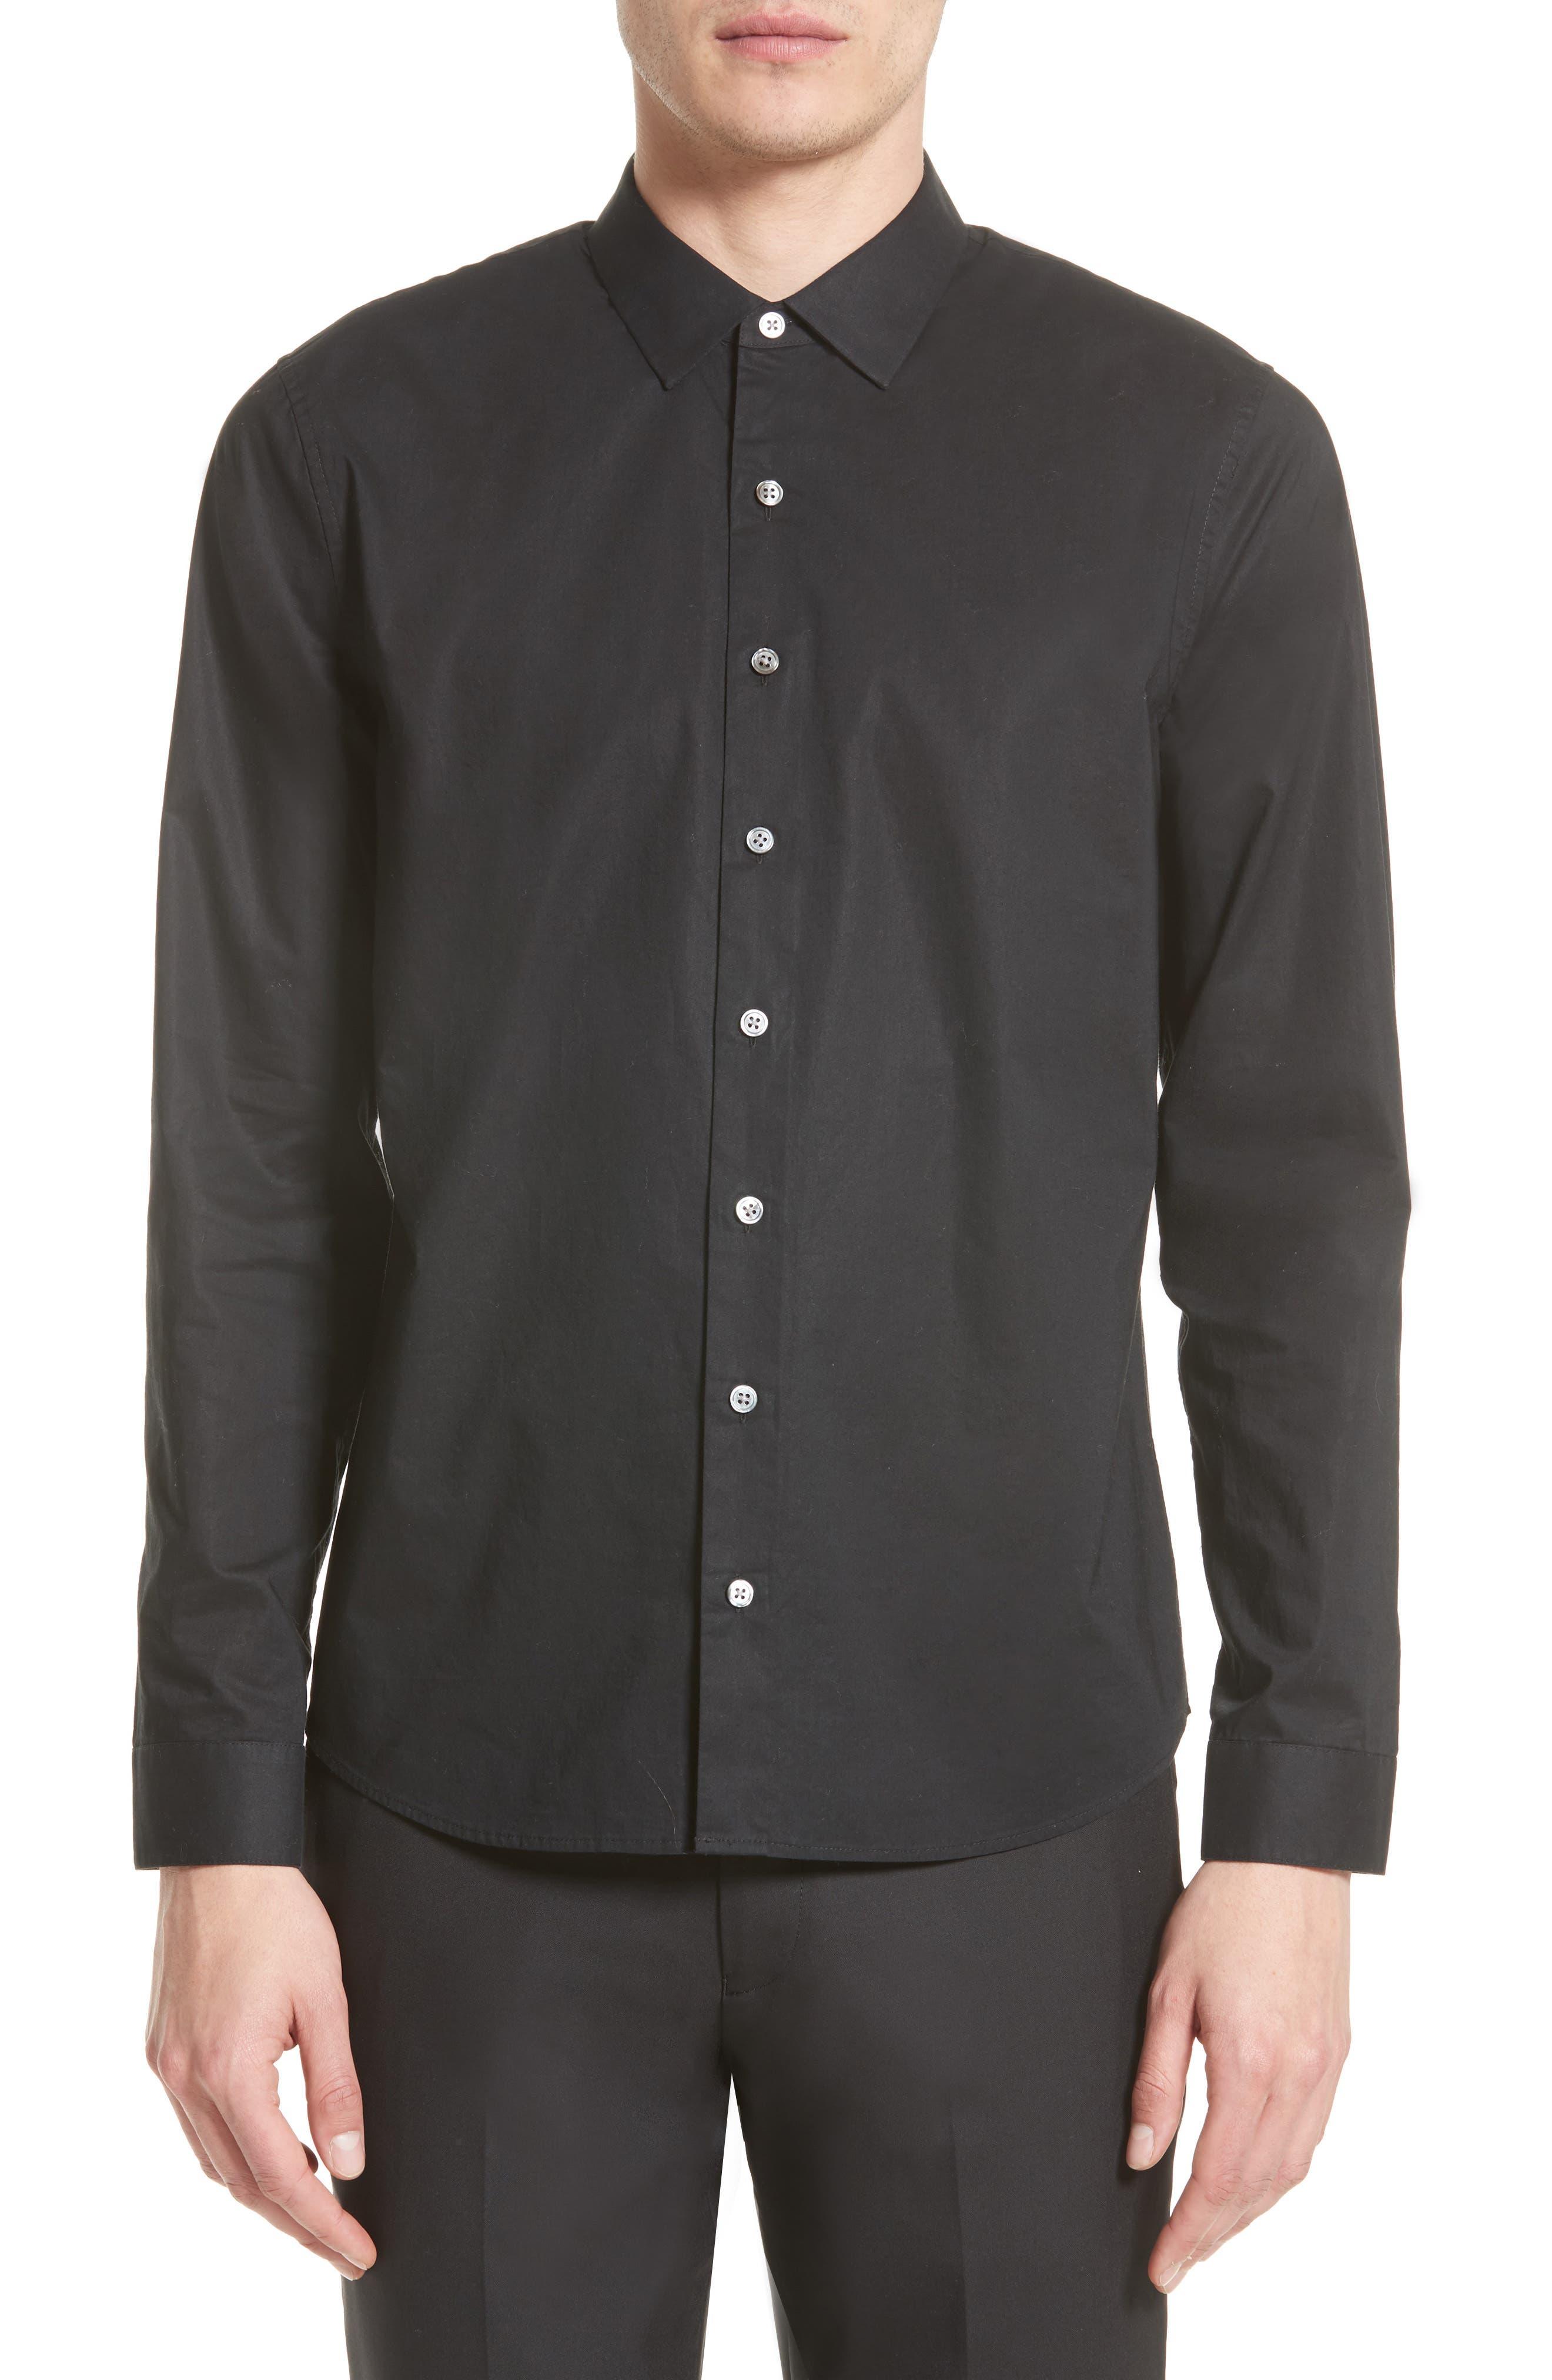 Alternate Image 1 Selected - ATM Anthony Thomas Melillo Cotton Dress Shirt